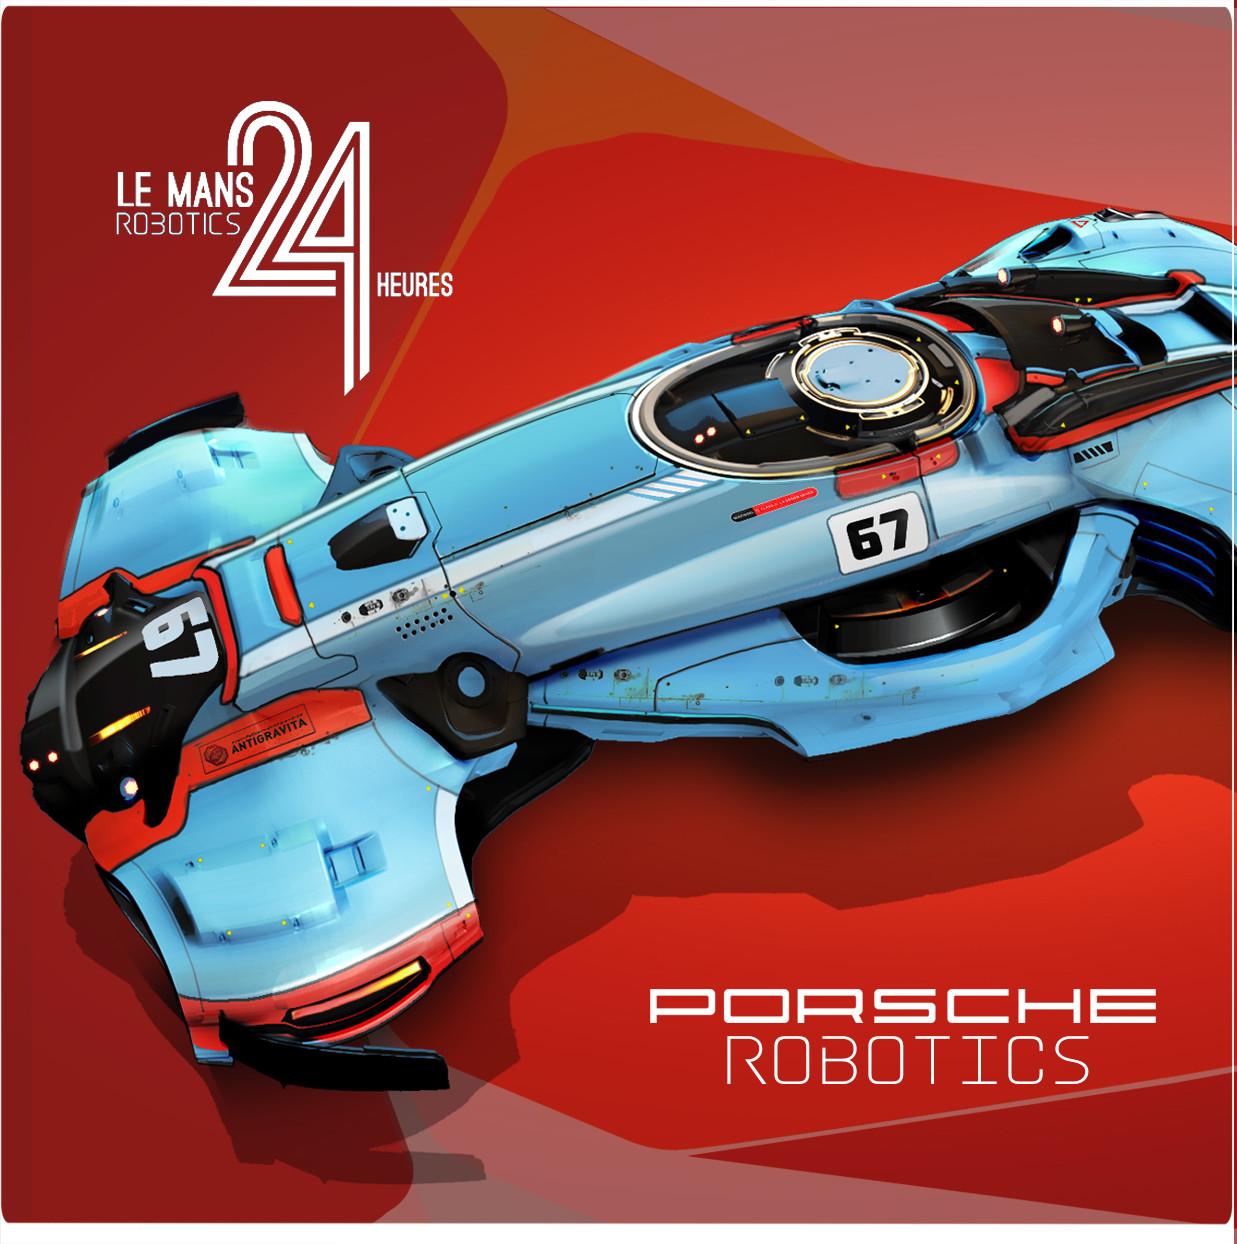 LE MANS 24 - ROBOTICS